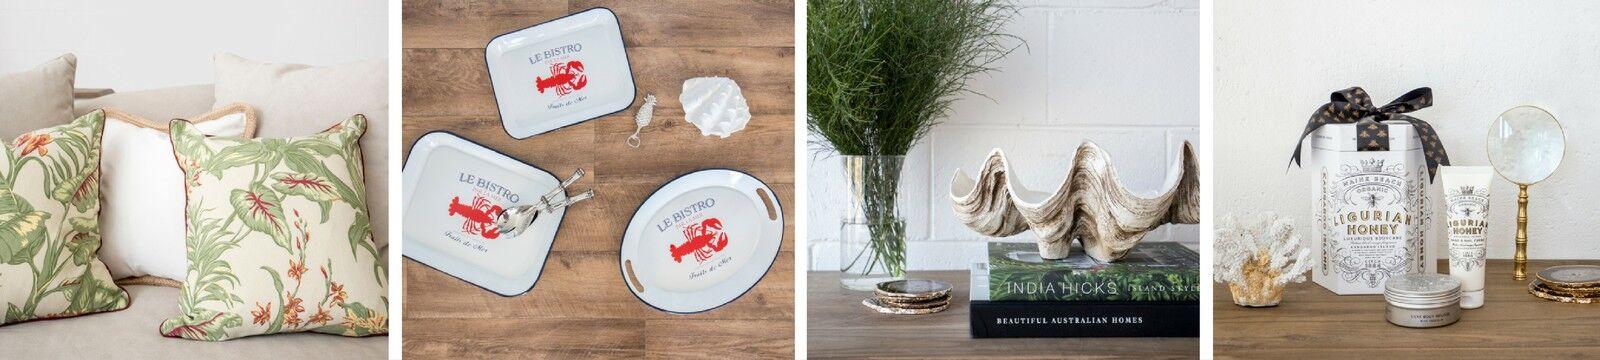 Hamptons Home Lifestyle & Homewares